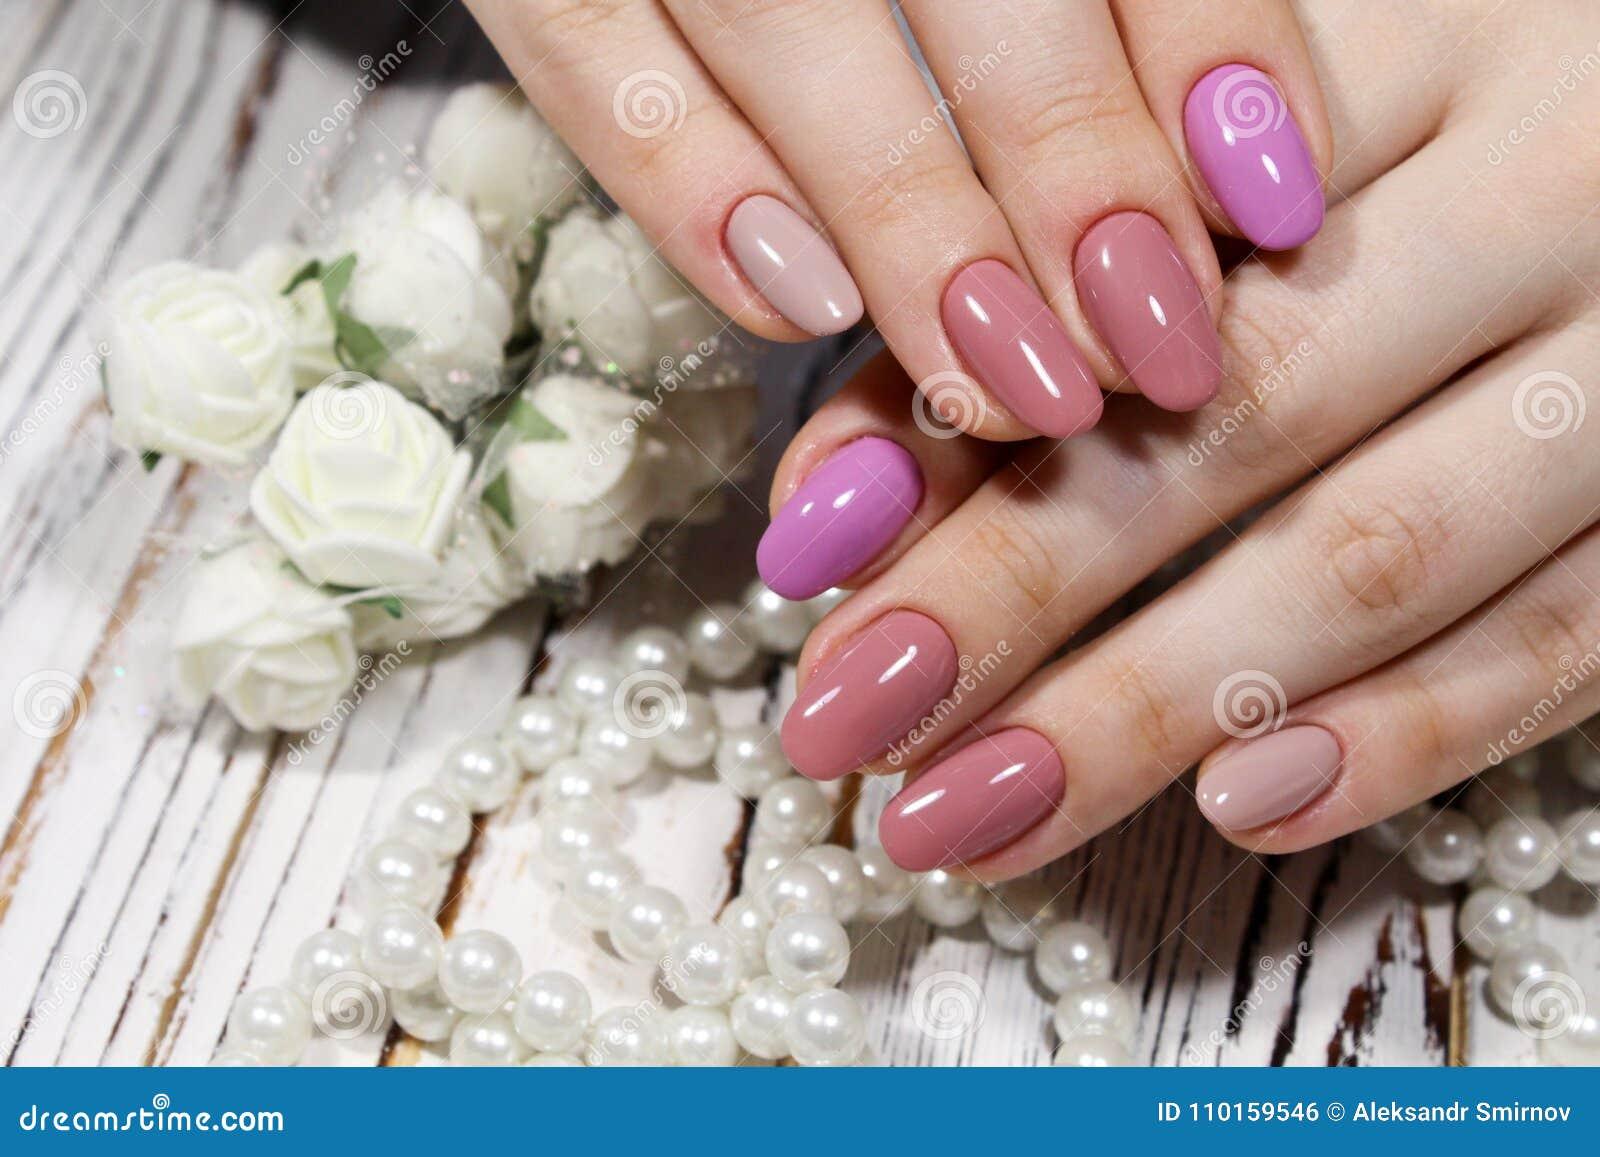 Perfect manicure and natural nails. Attractive modern nail art design. Gel  polish applied. - Perfect Manicure And Natural Nails. Stock Photo - Image Of Nail